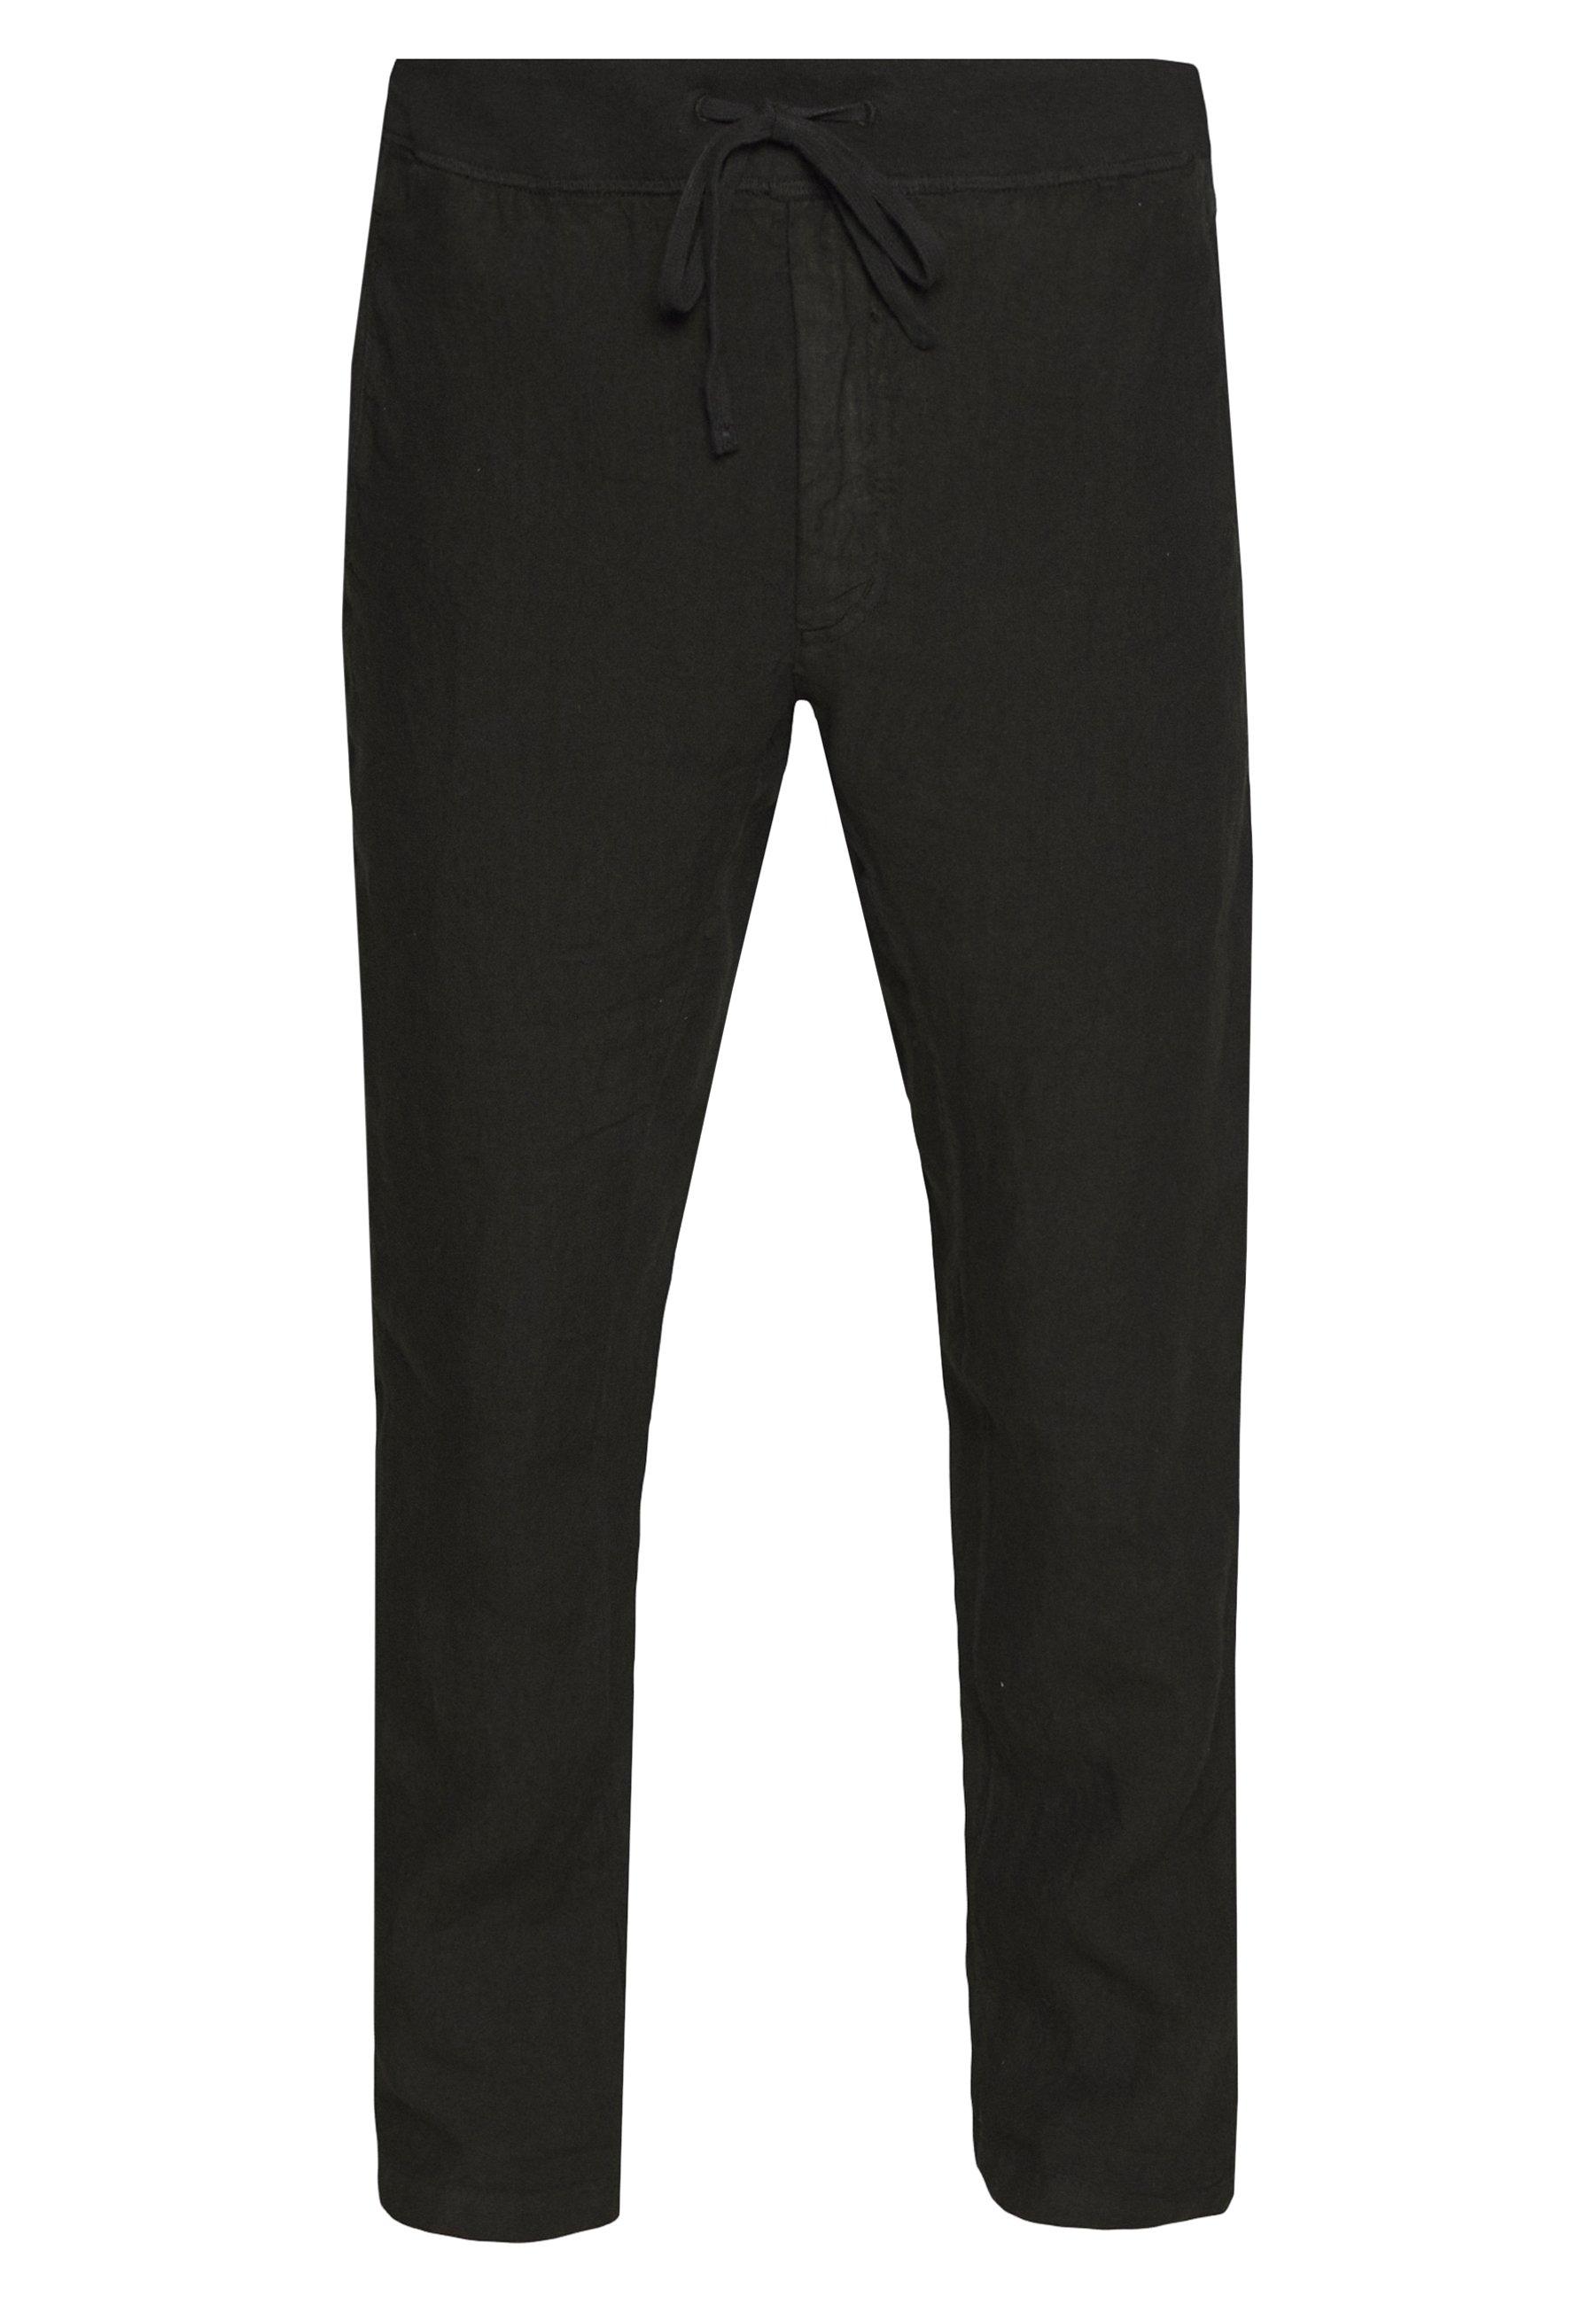 120% Lino Trousers - Tygbyxor Black